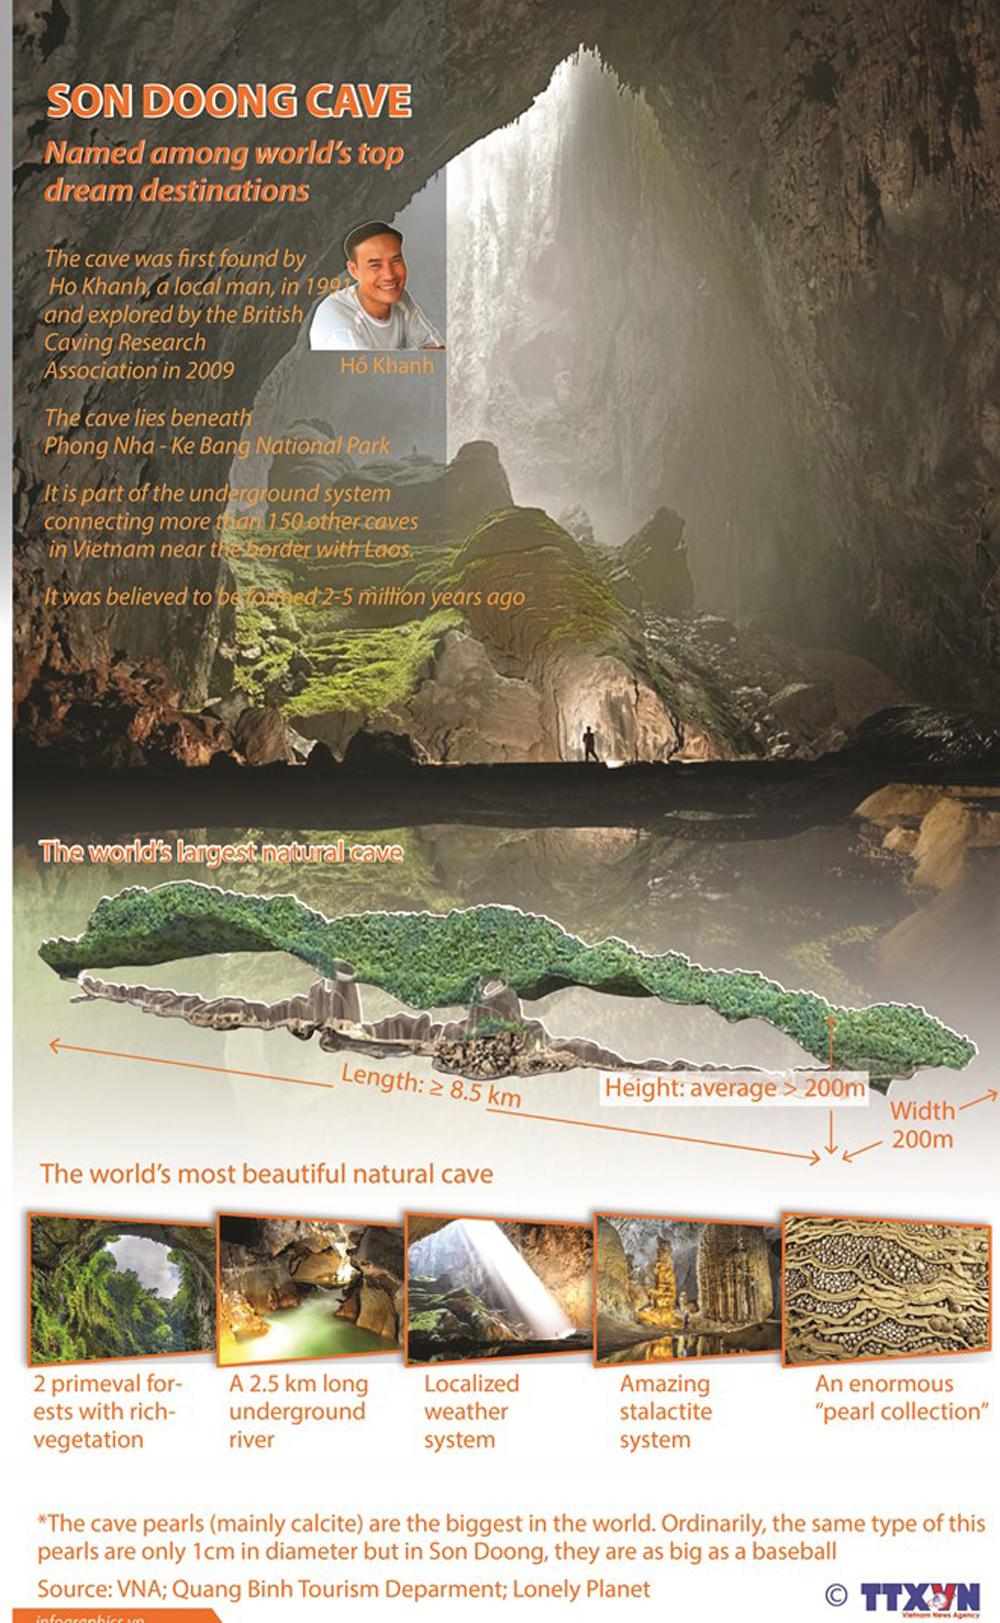 Son Doong Cave, top dream destinations, Quang Binh province, top destination, famous site